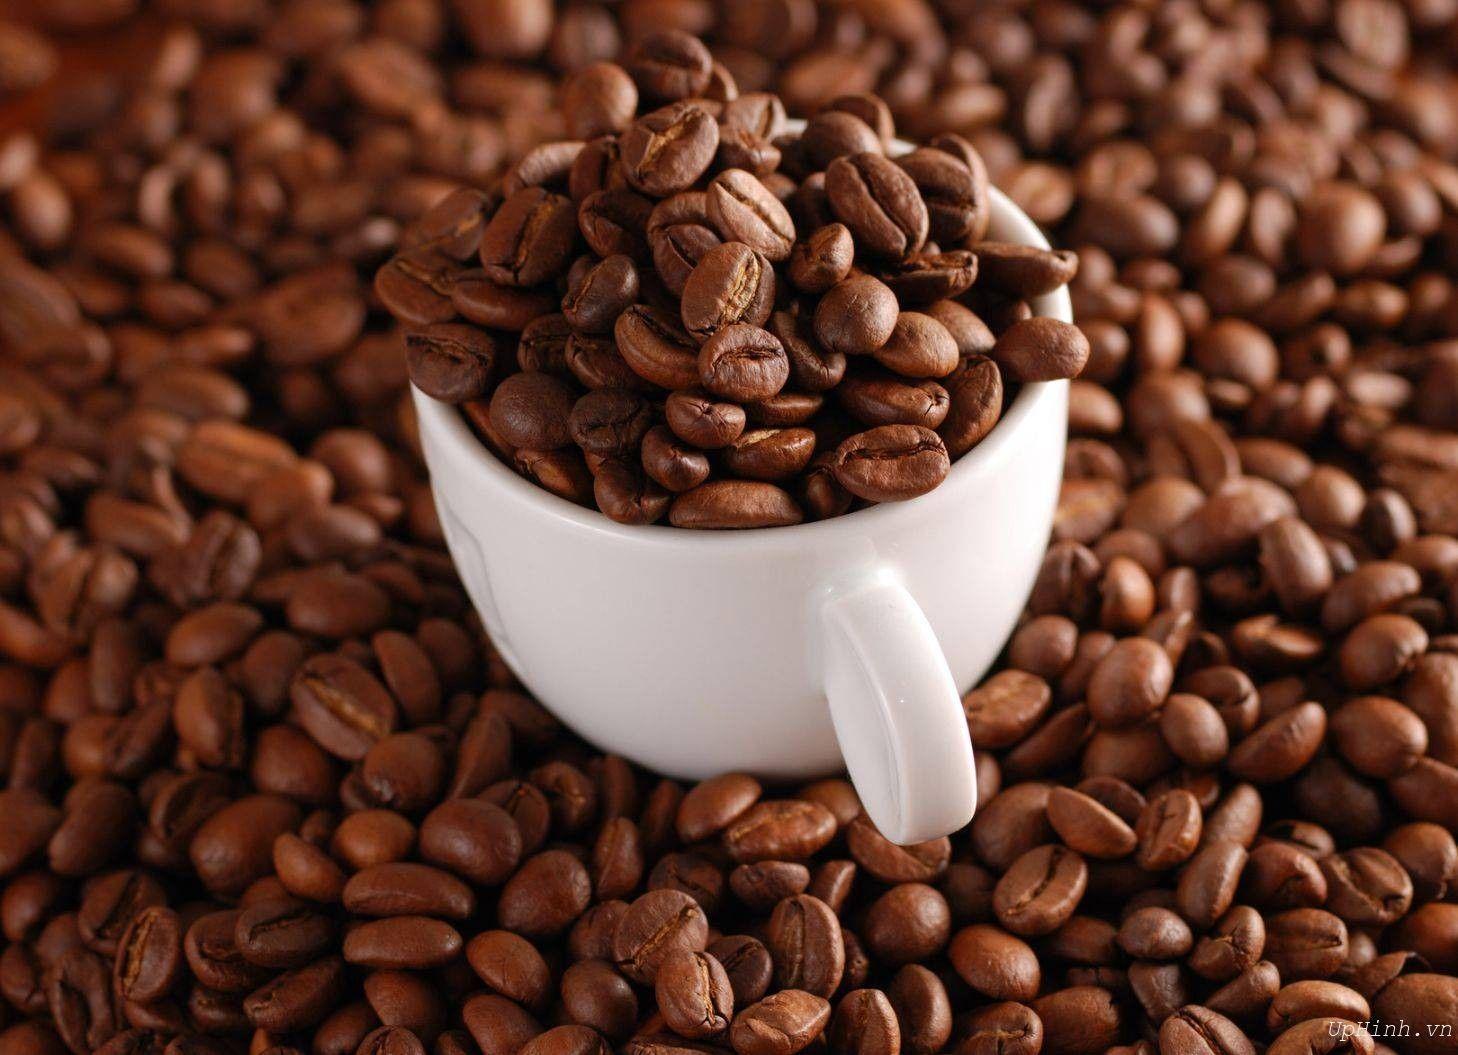 Coffee Bean And Tea Leaf Coffee Bean and Tea Leaf